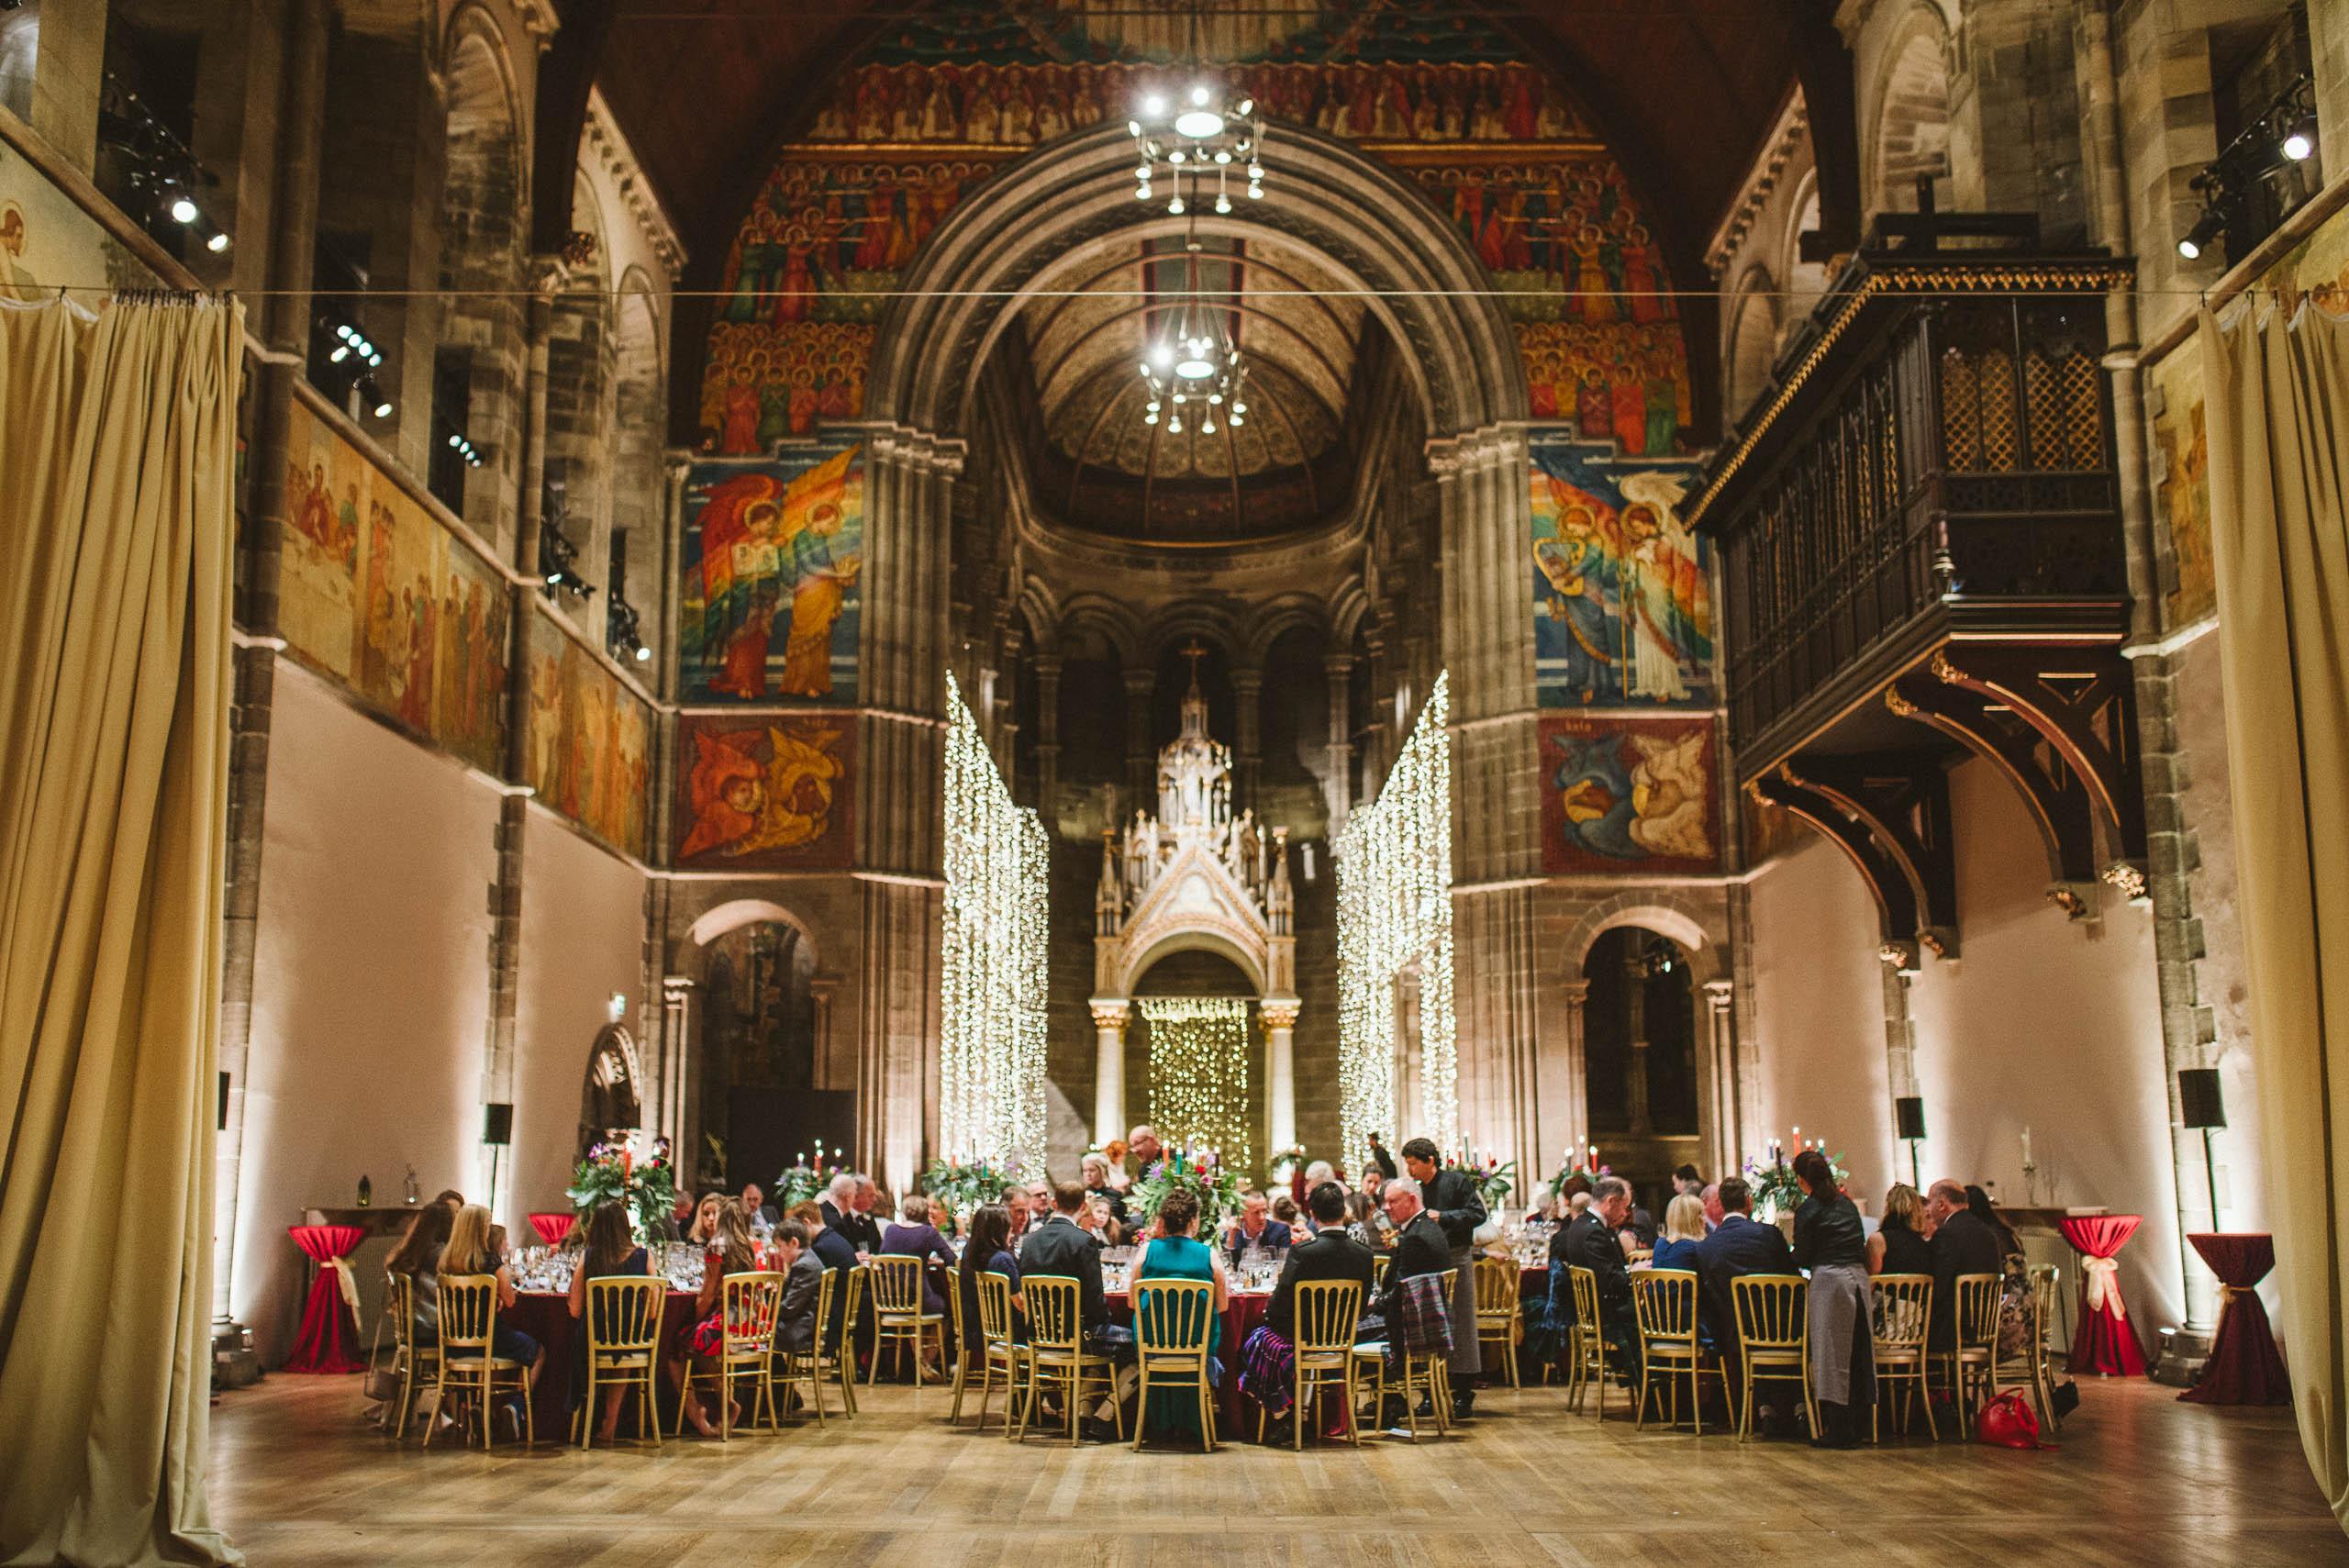 Gorgeous view of ceremony hall at Mansfield Traquair Edinburgh